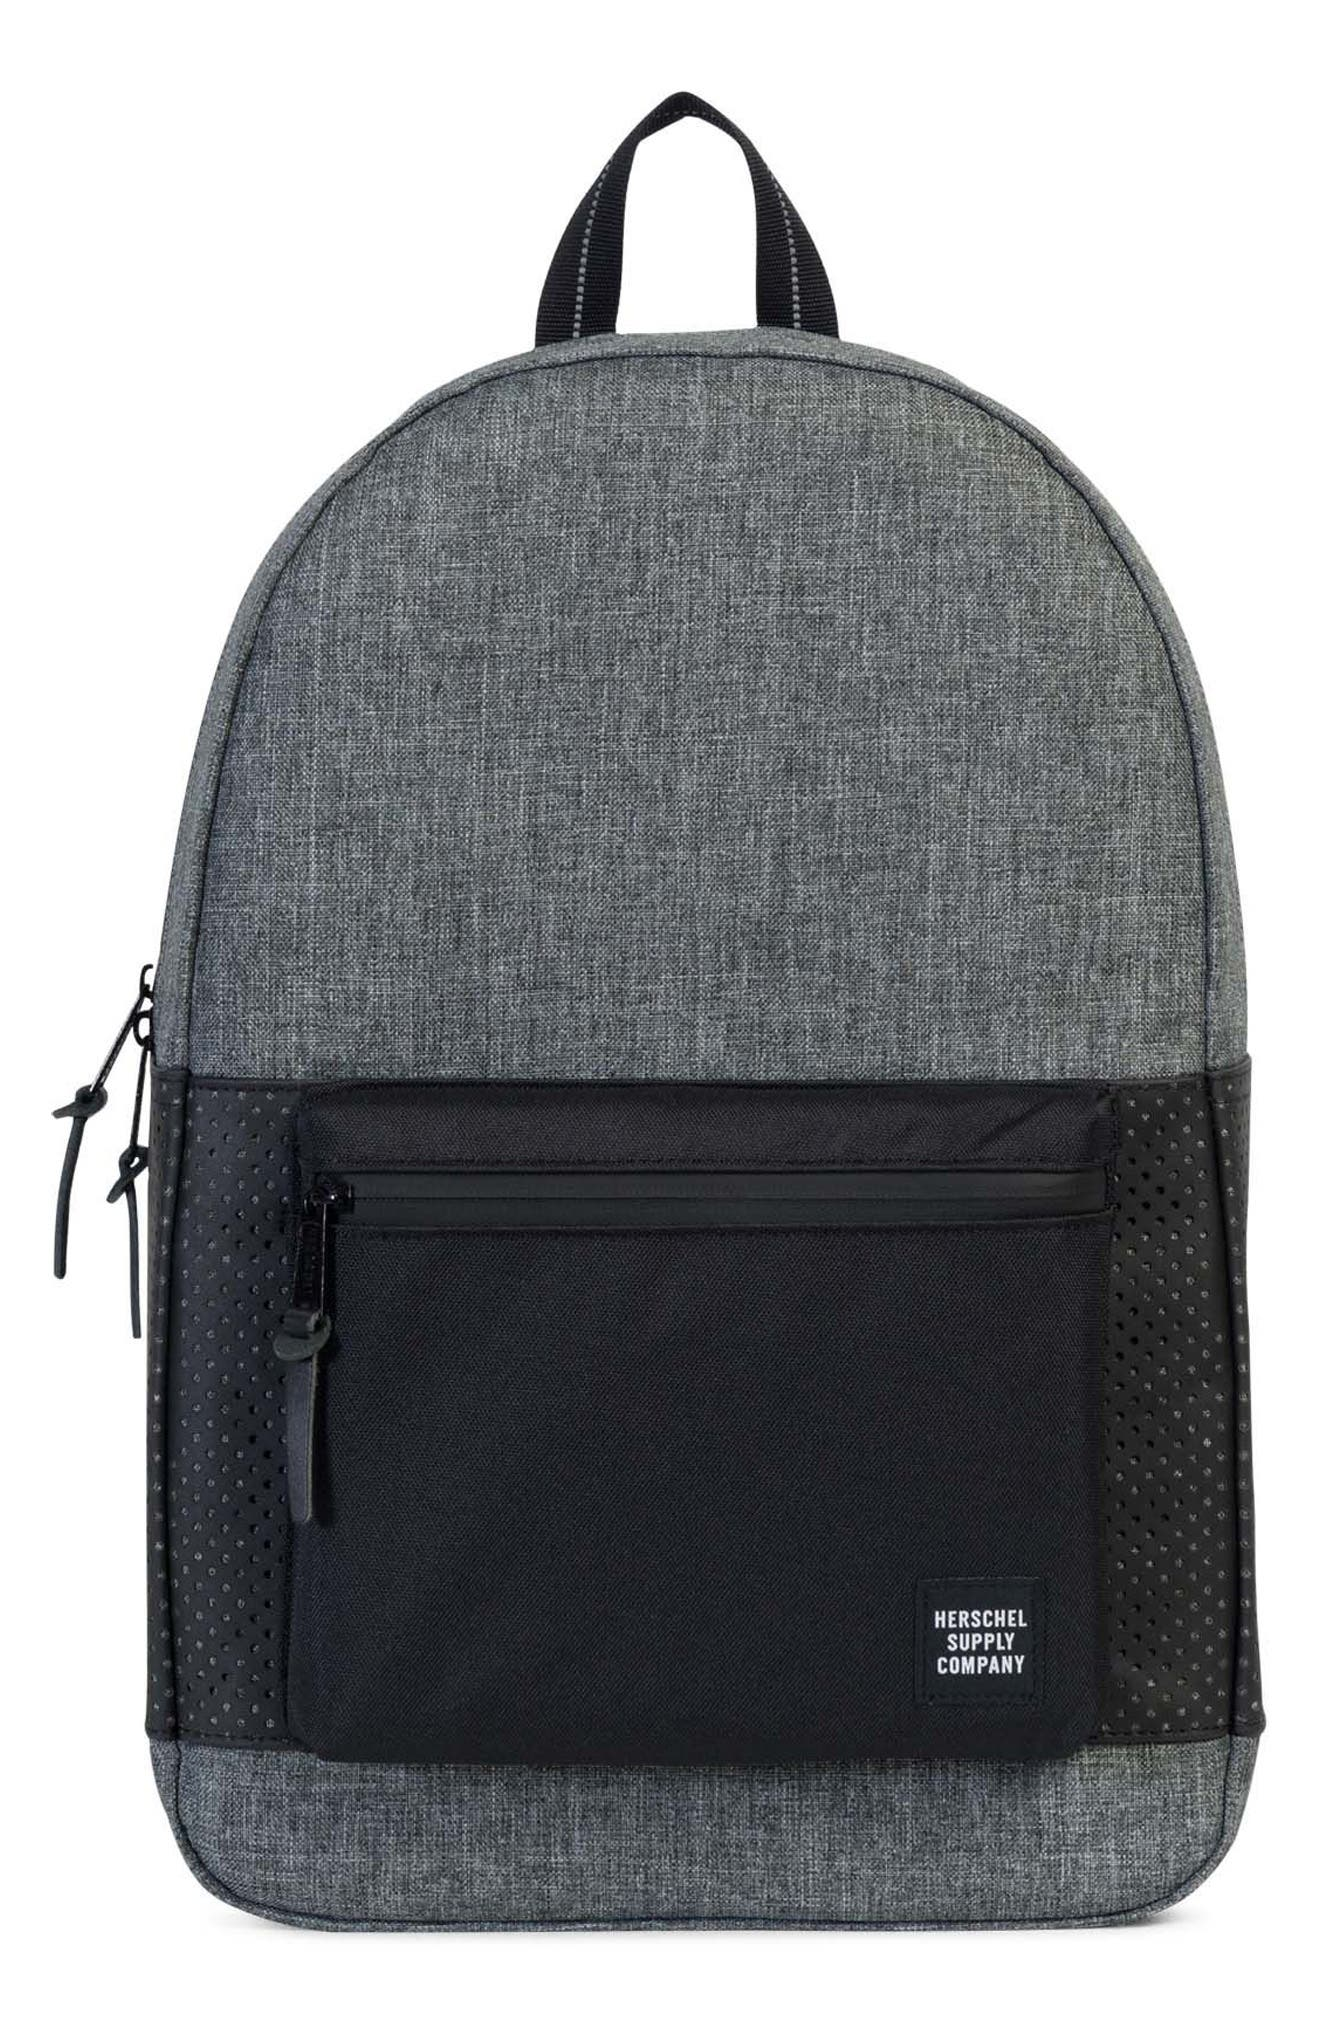 Alternate Image 1 Selected - Herschel Supply Co. Settlement Aspect Backpack